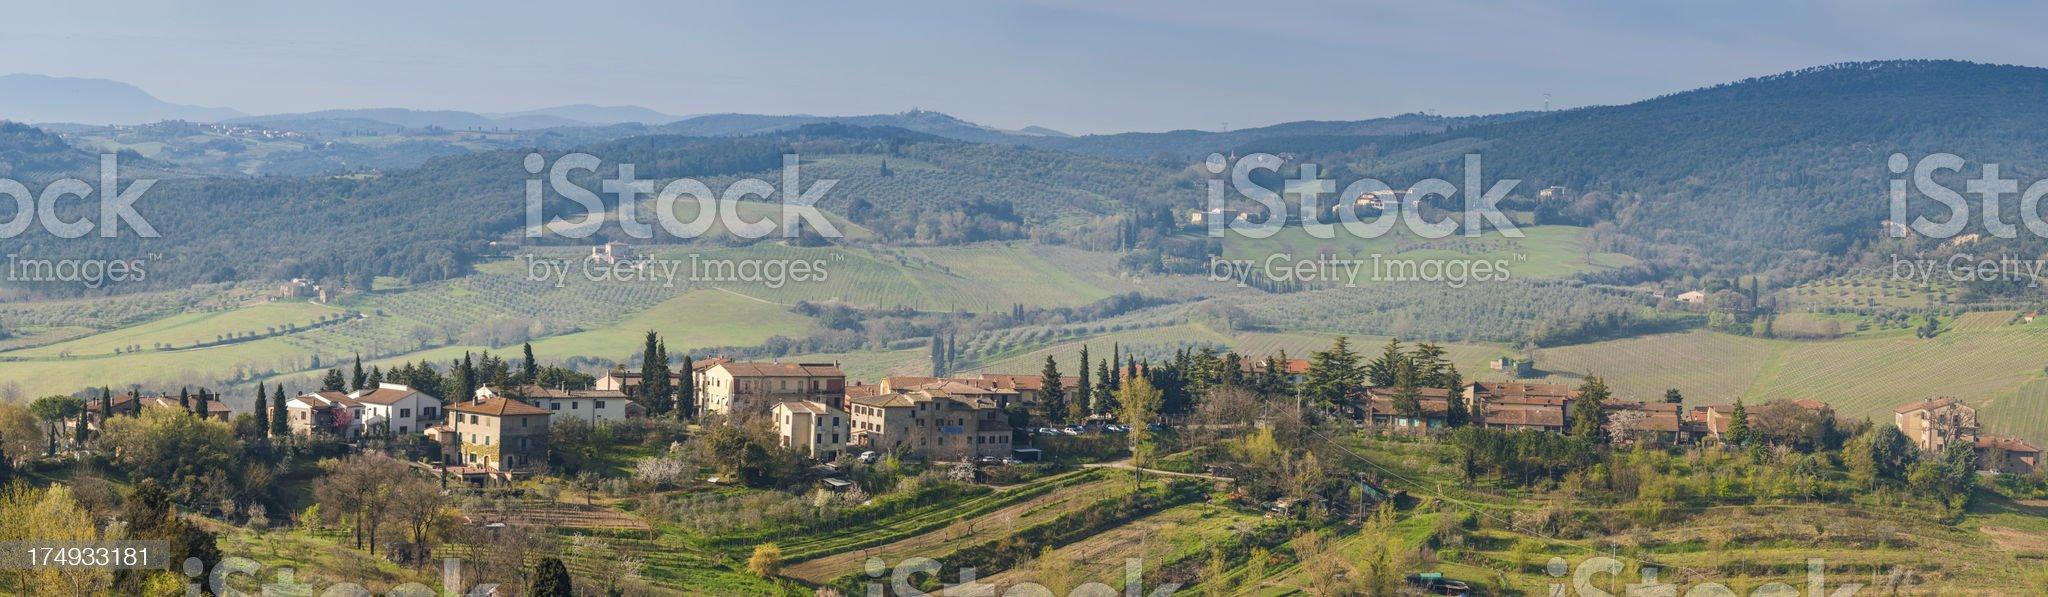 Tuscany hilltop village panorama Italy royalty-free stock photo